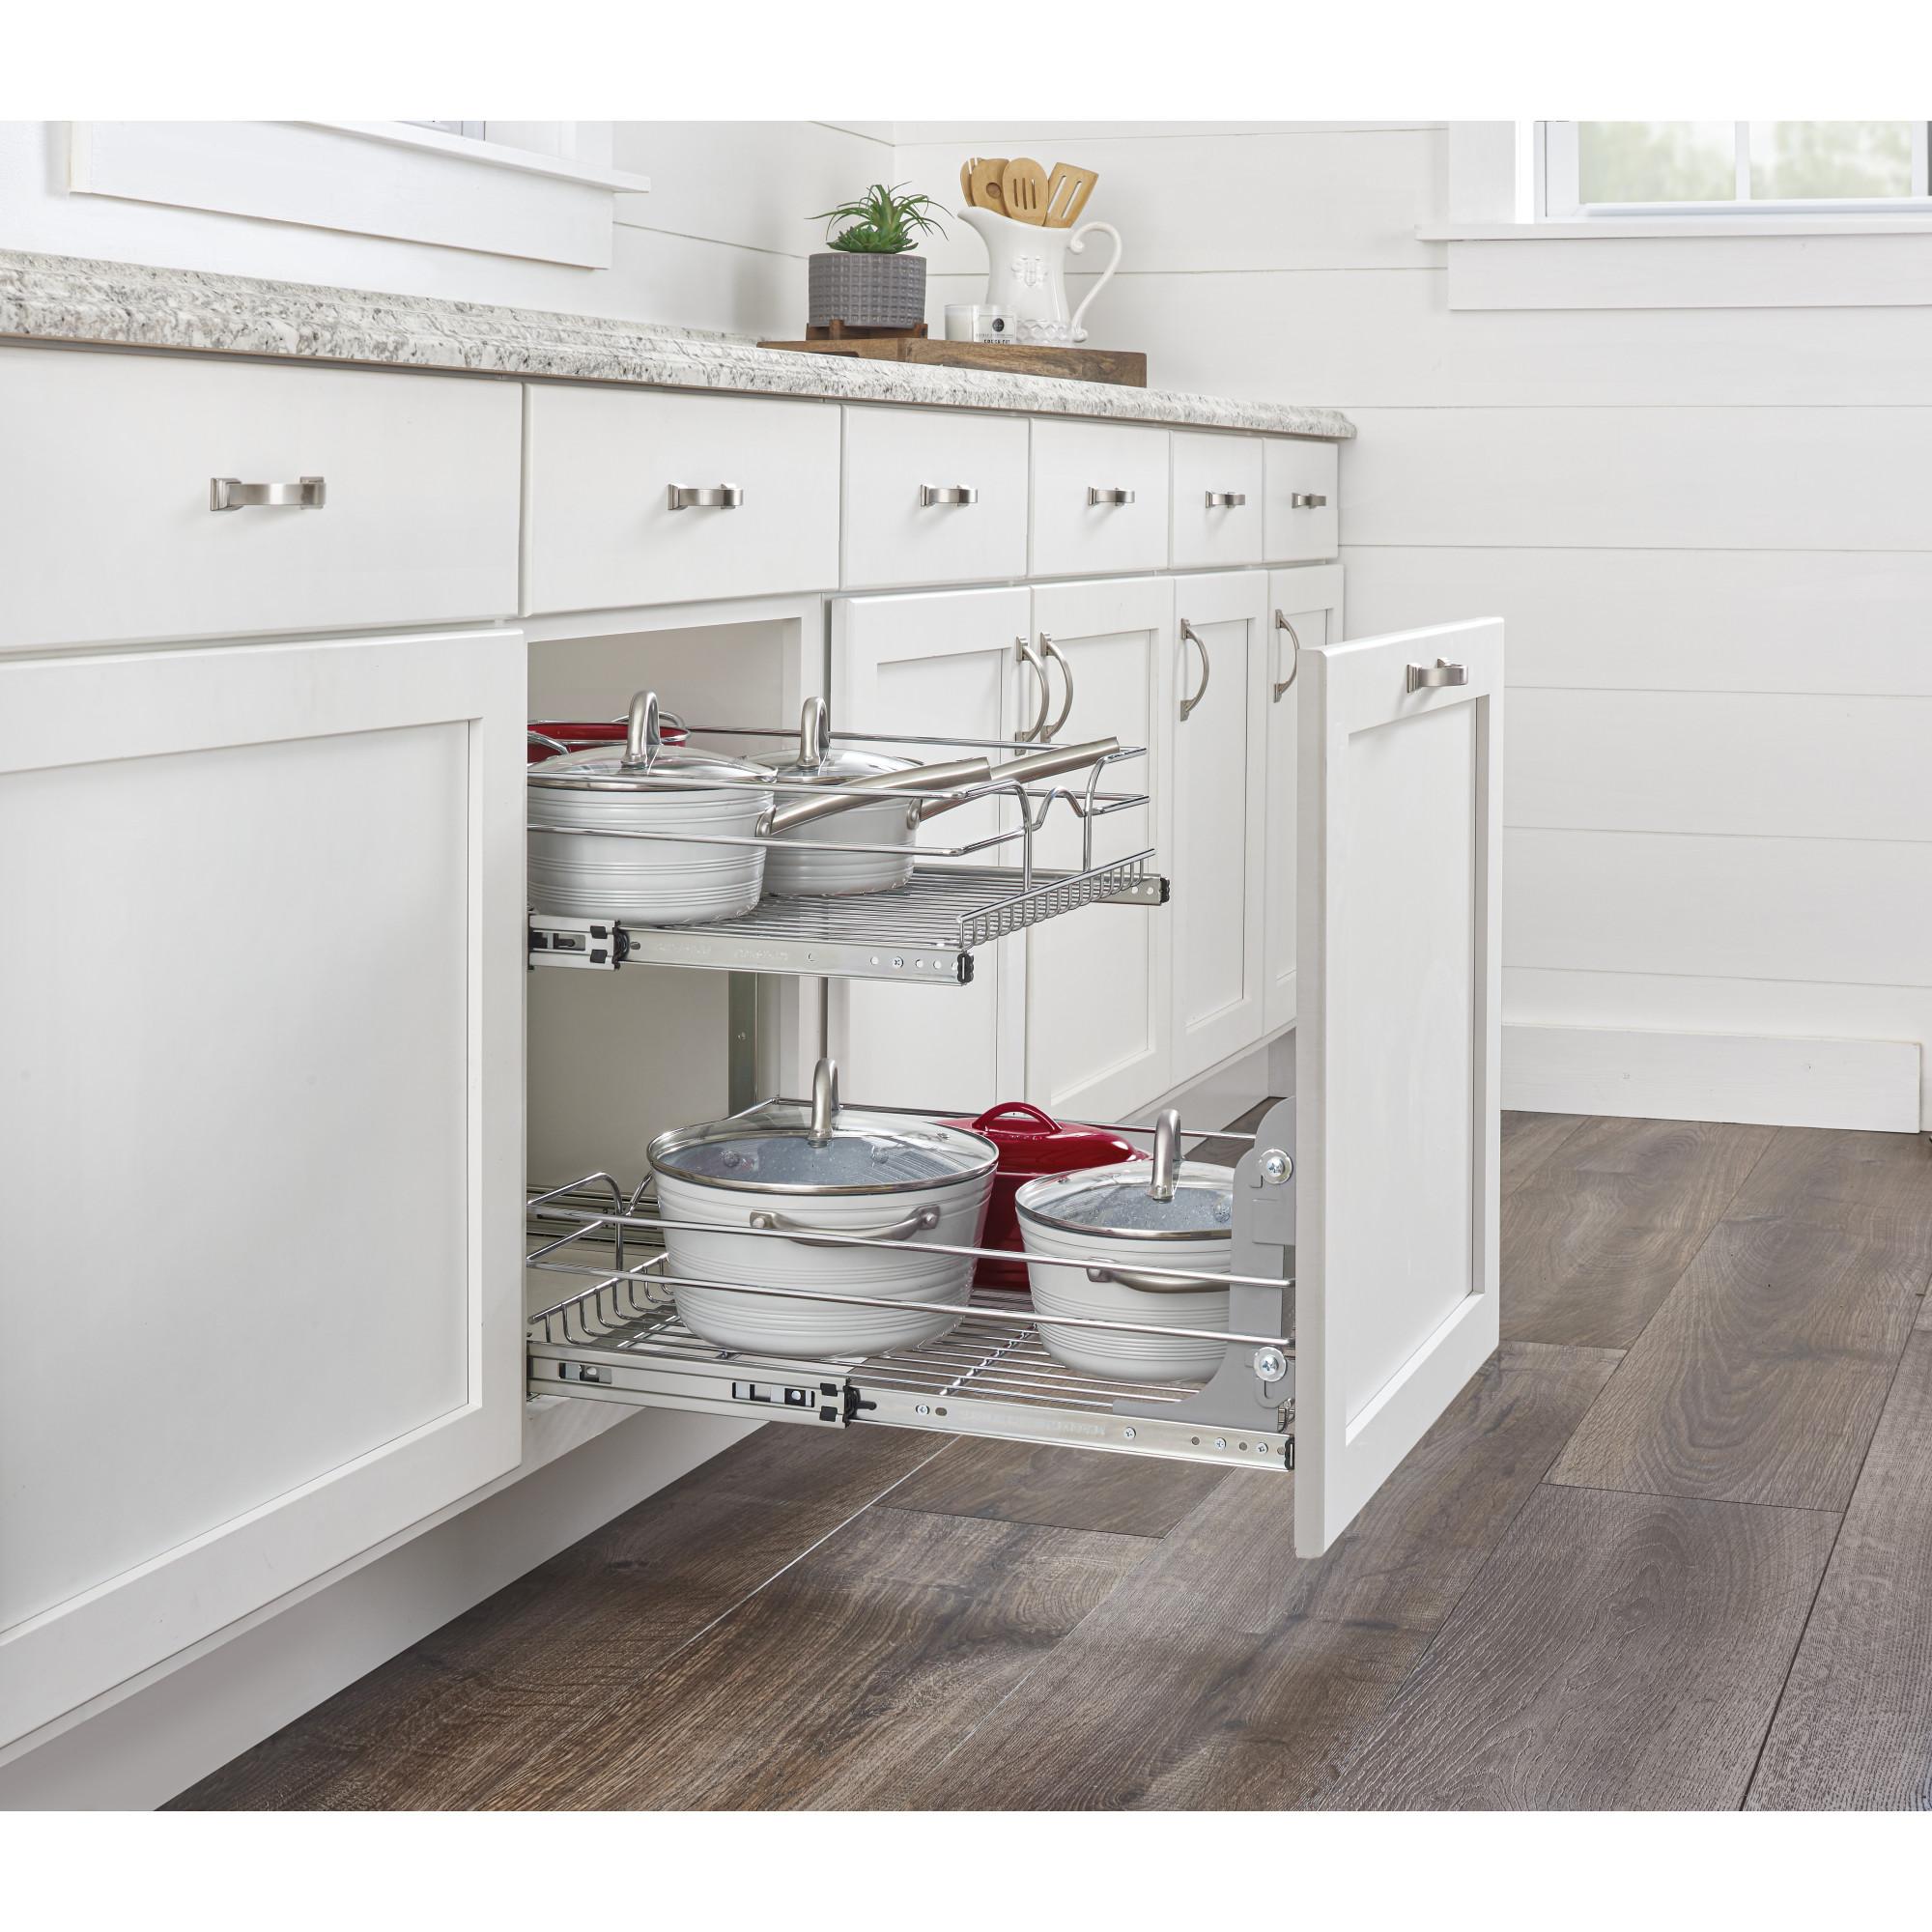 "Rev-A-Shelf 5WB2-1822CR-1 18"" x 22"" 2-Tier Cabinet Pull ..."